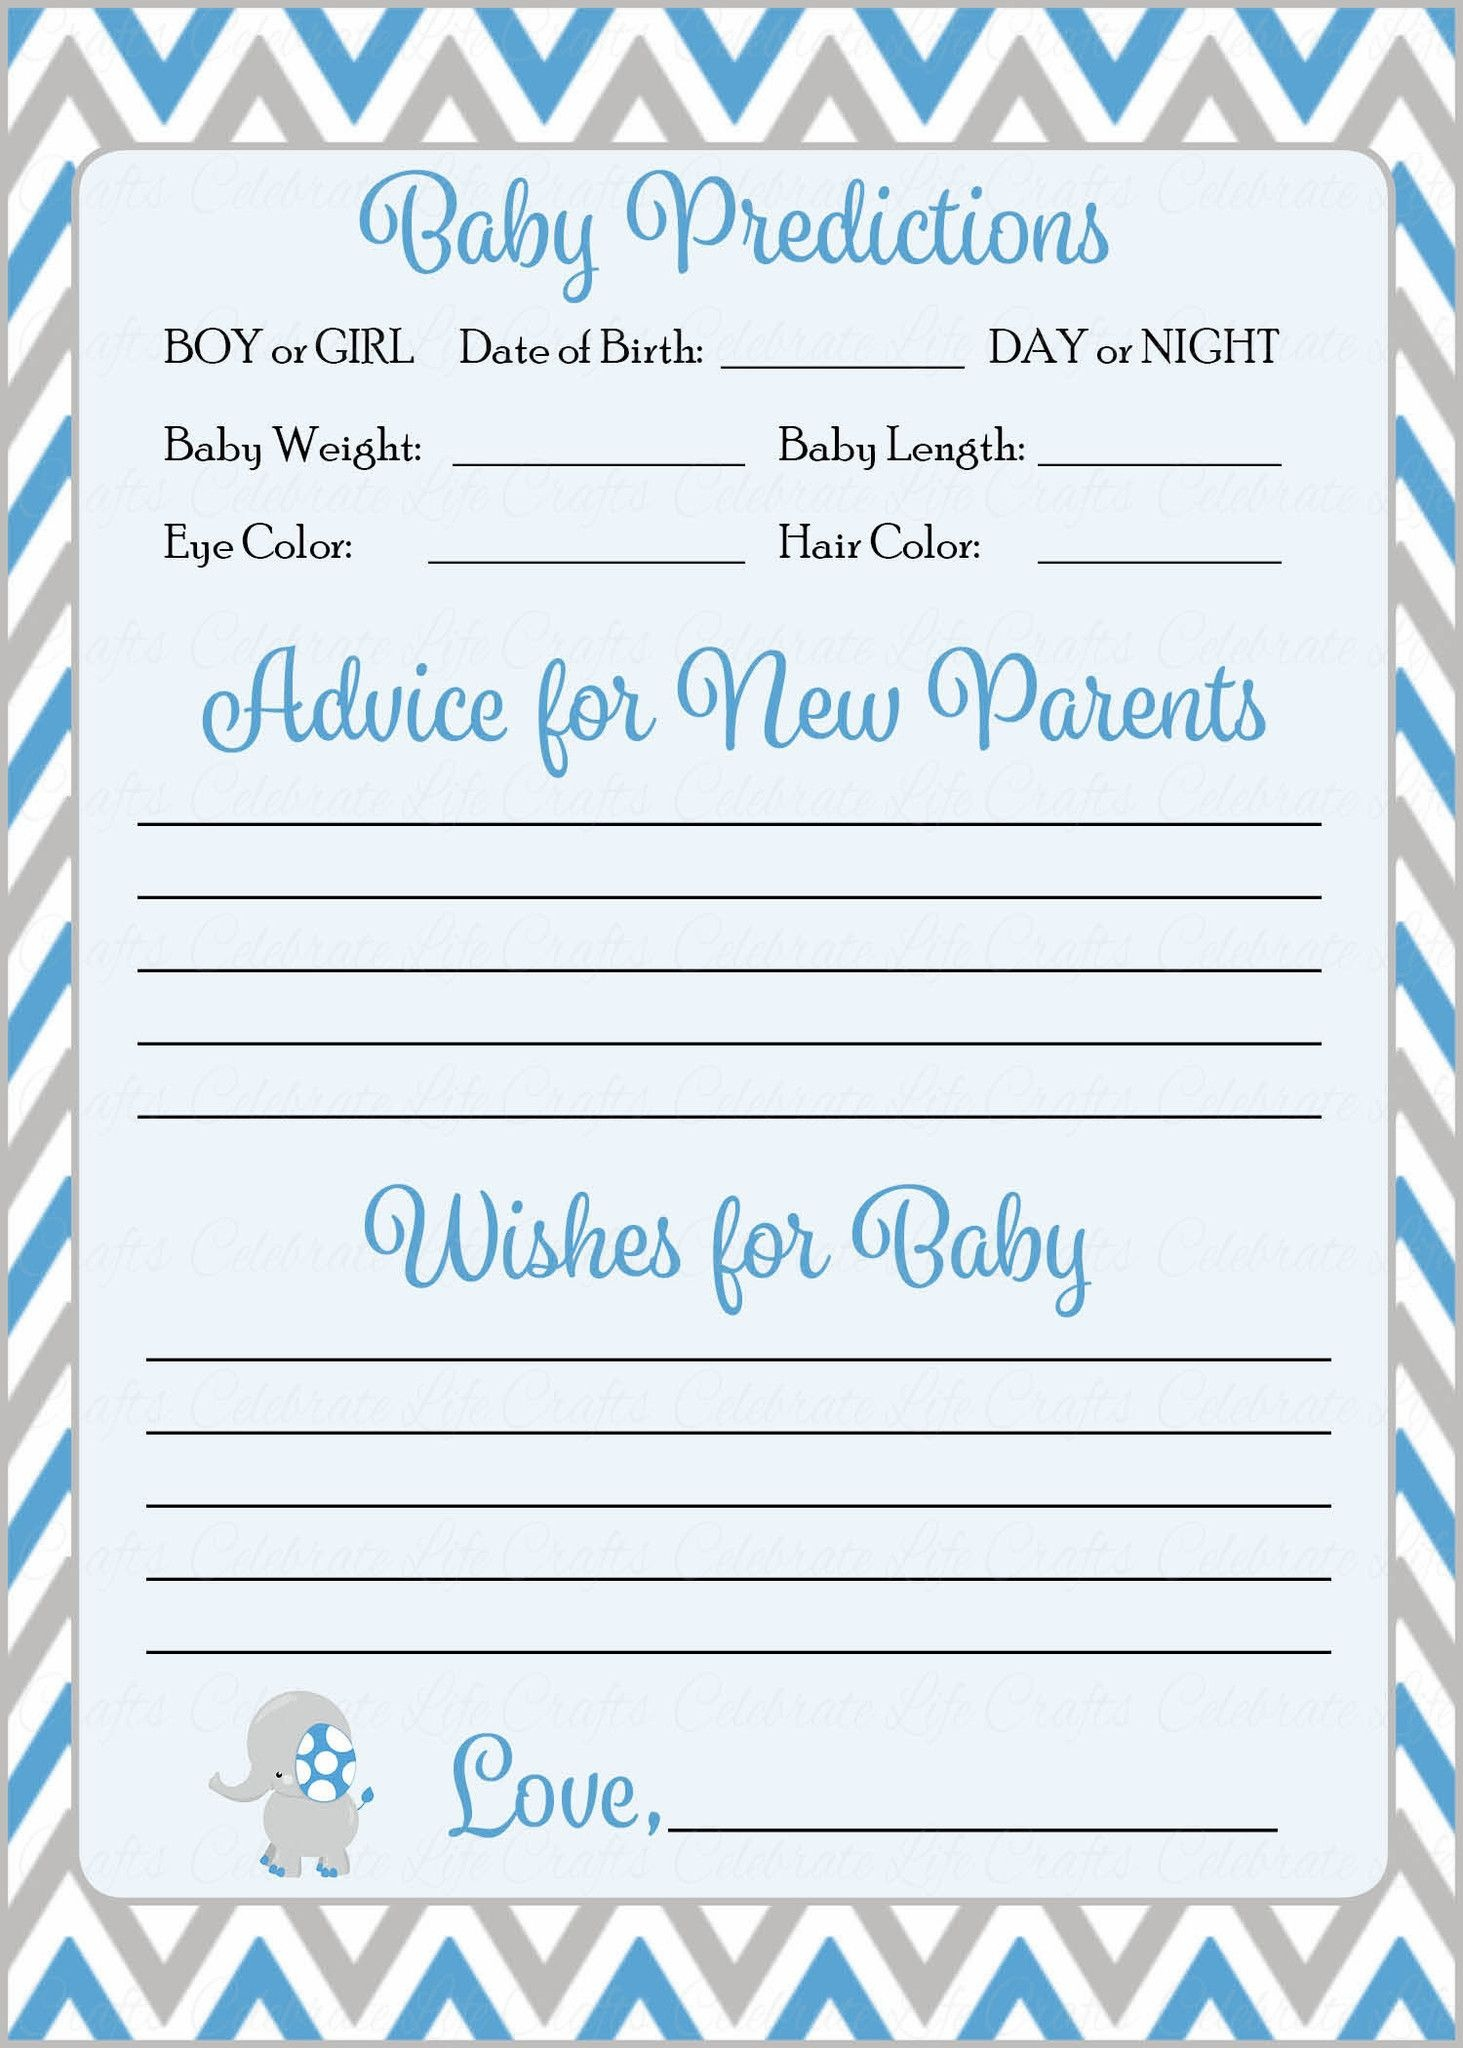 Prediction & Advice Cards - Printable Download - Blue & Gray Baby - Baby Prediction And Advice Cards Free Printable